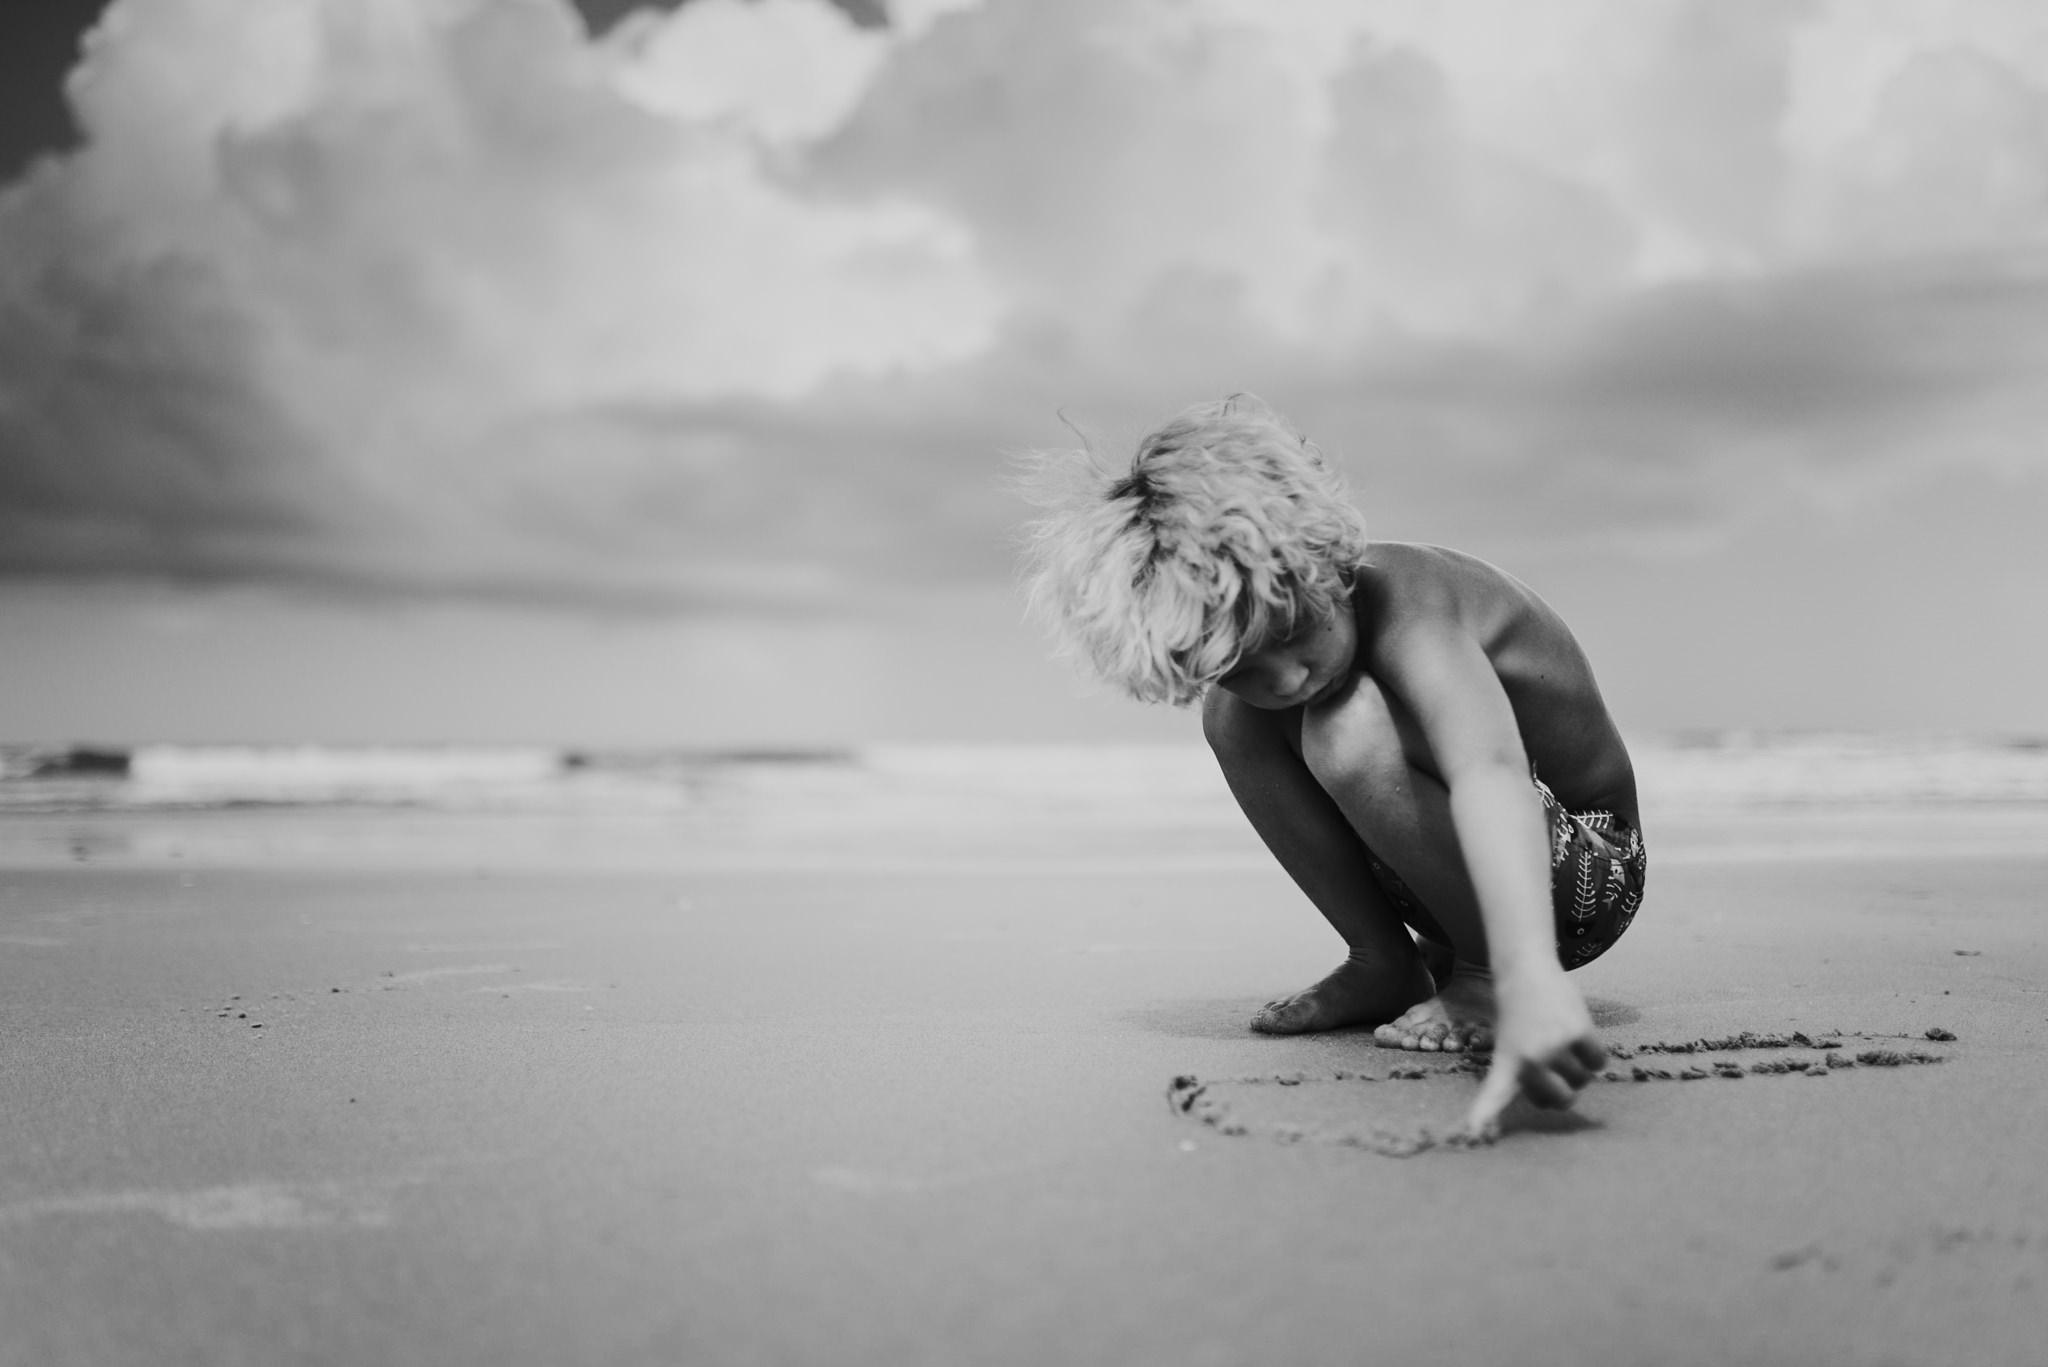 twyla jones photography - treasure coast florida - stormy beach boy playing in sand--9.jpg